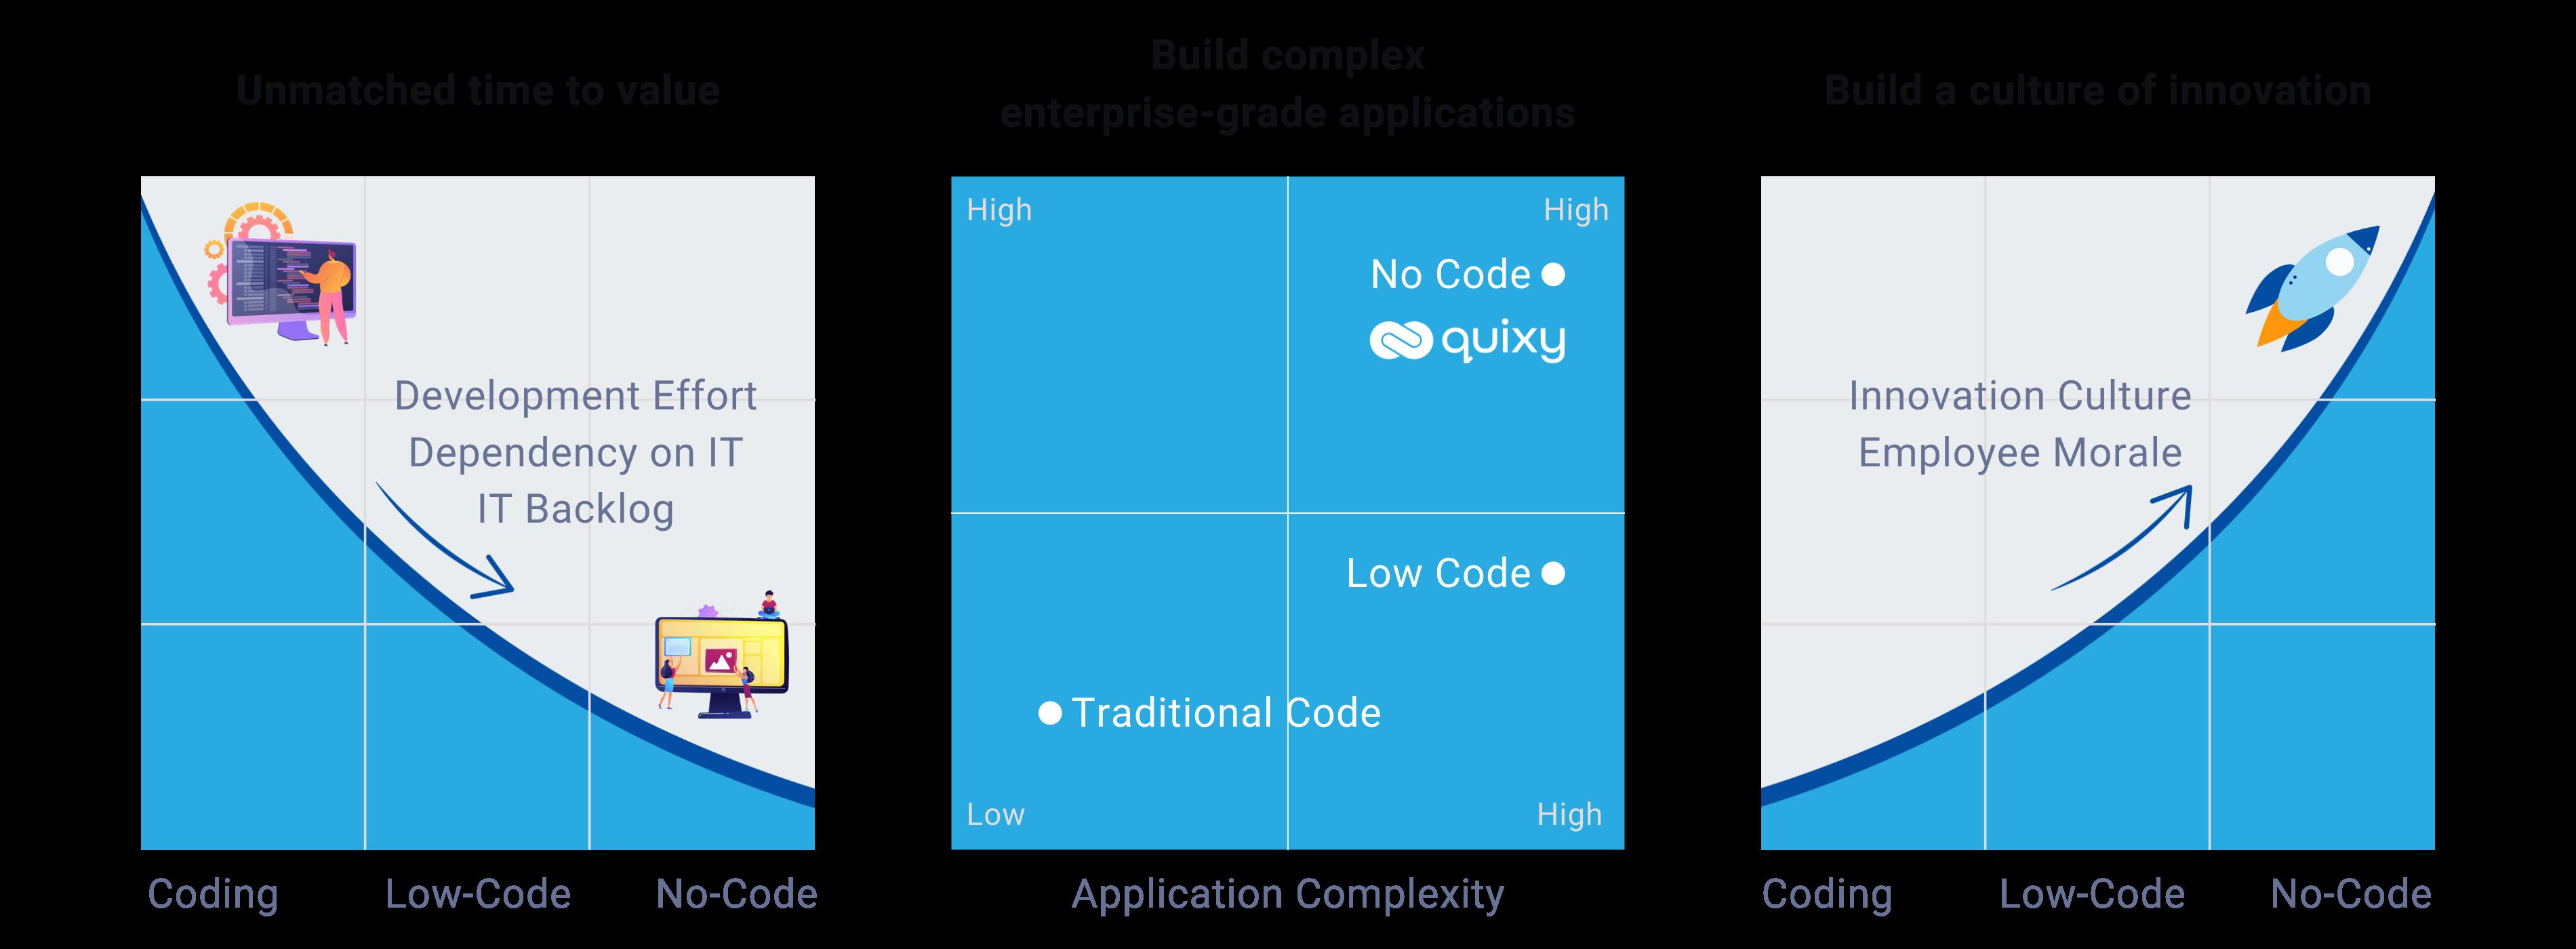 Coding vs Low-code vs No-code